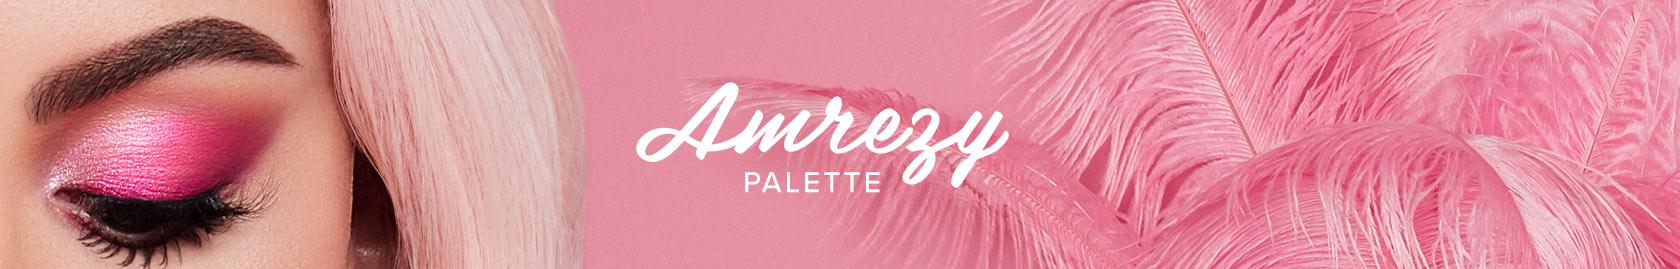 Amrezy Palette